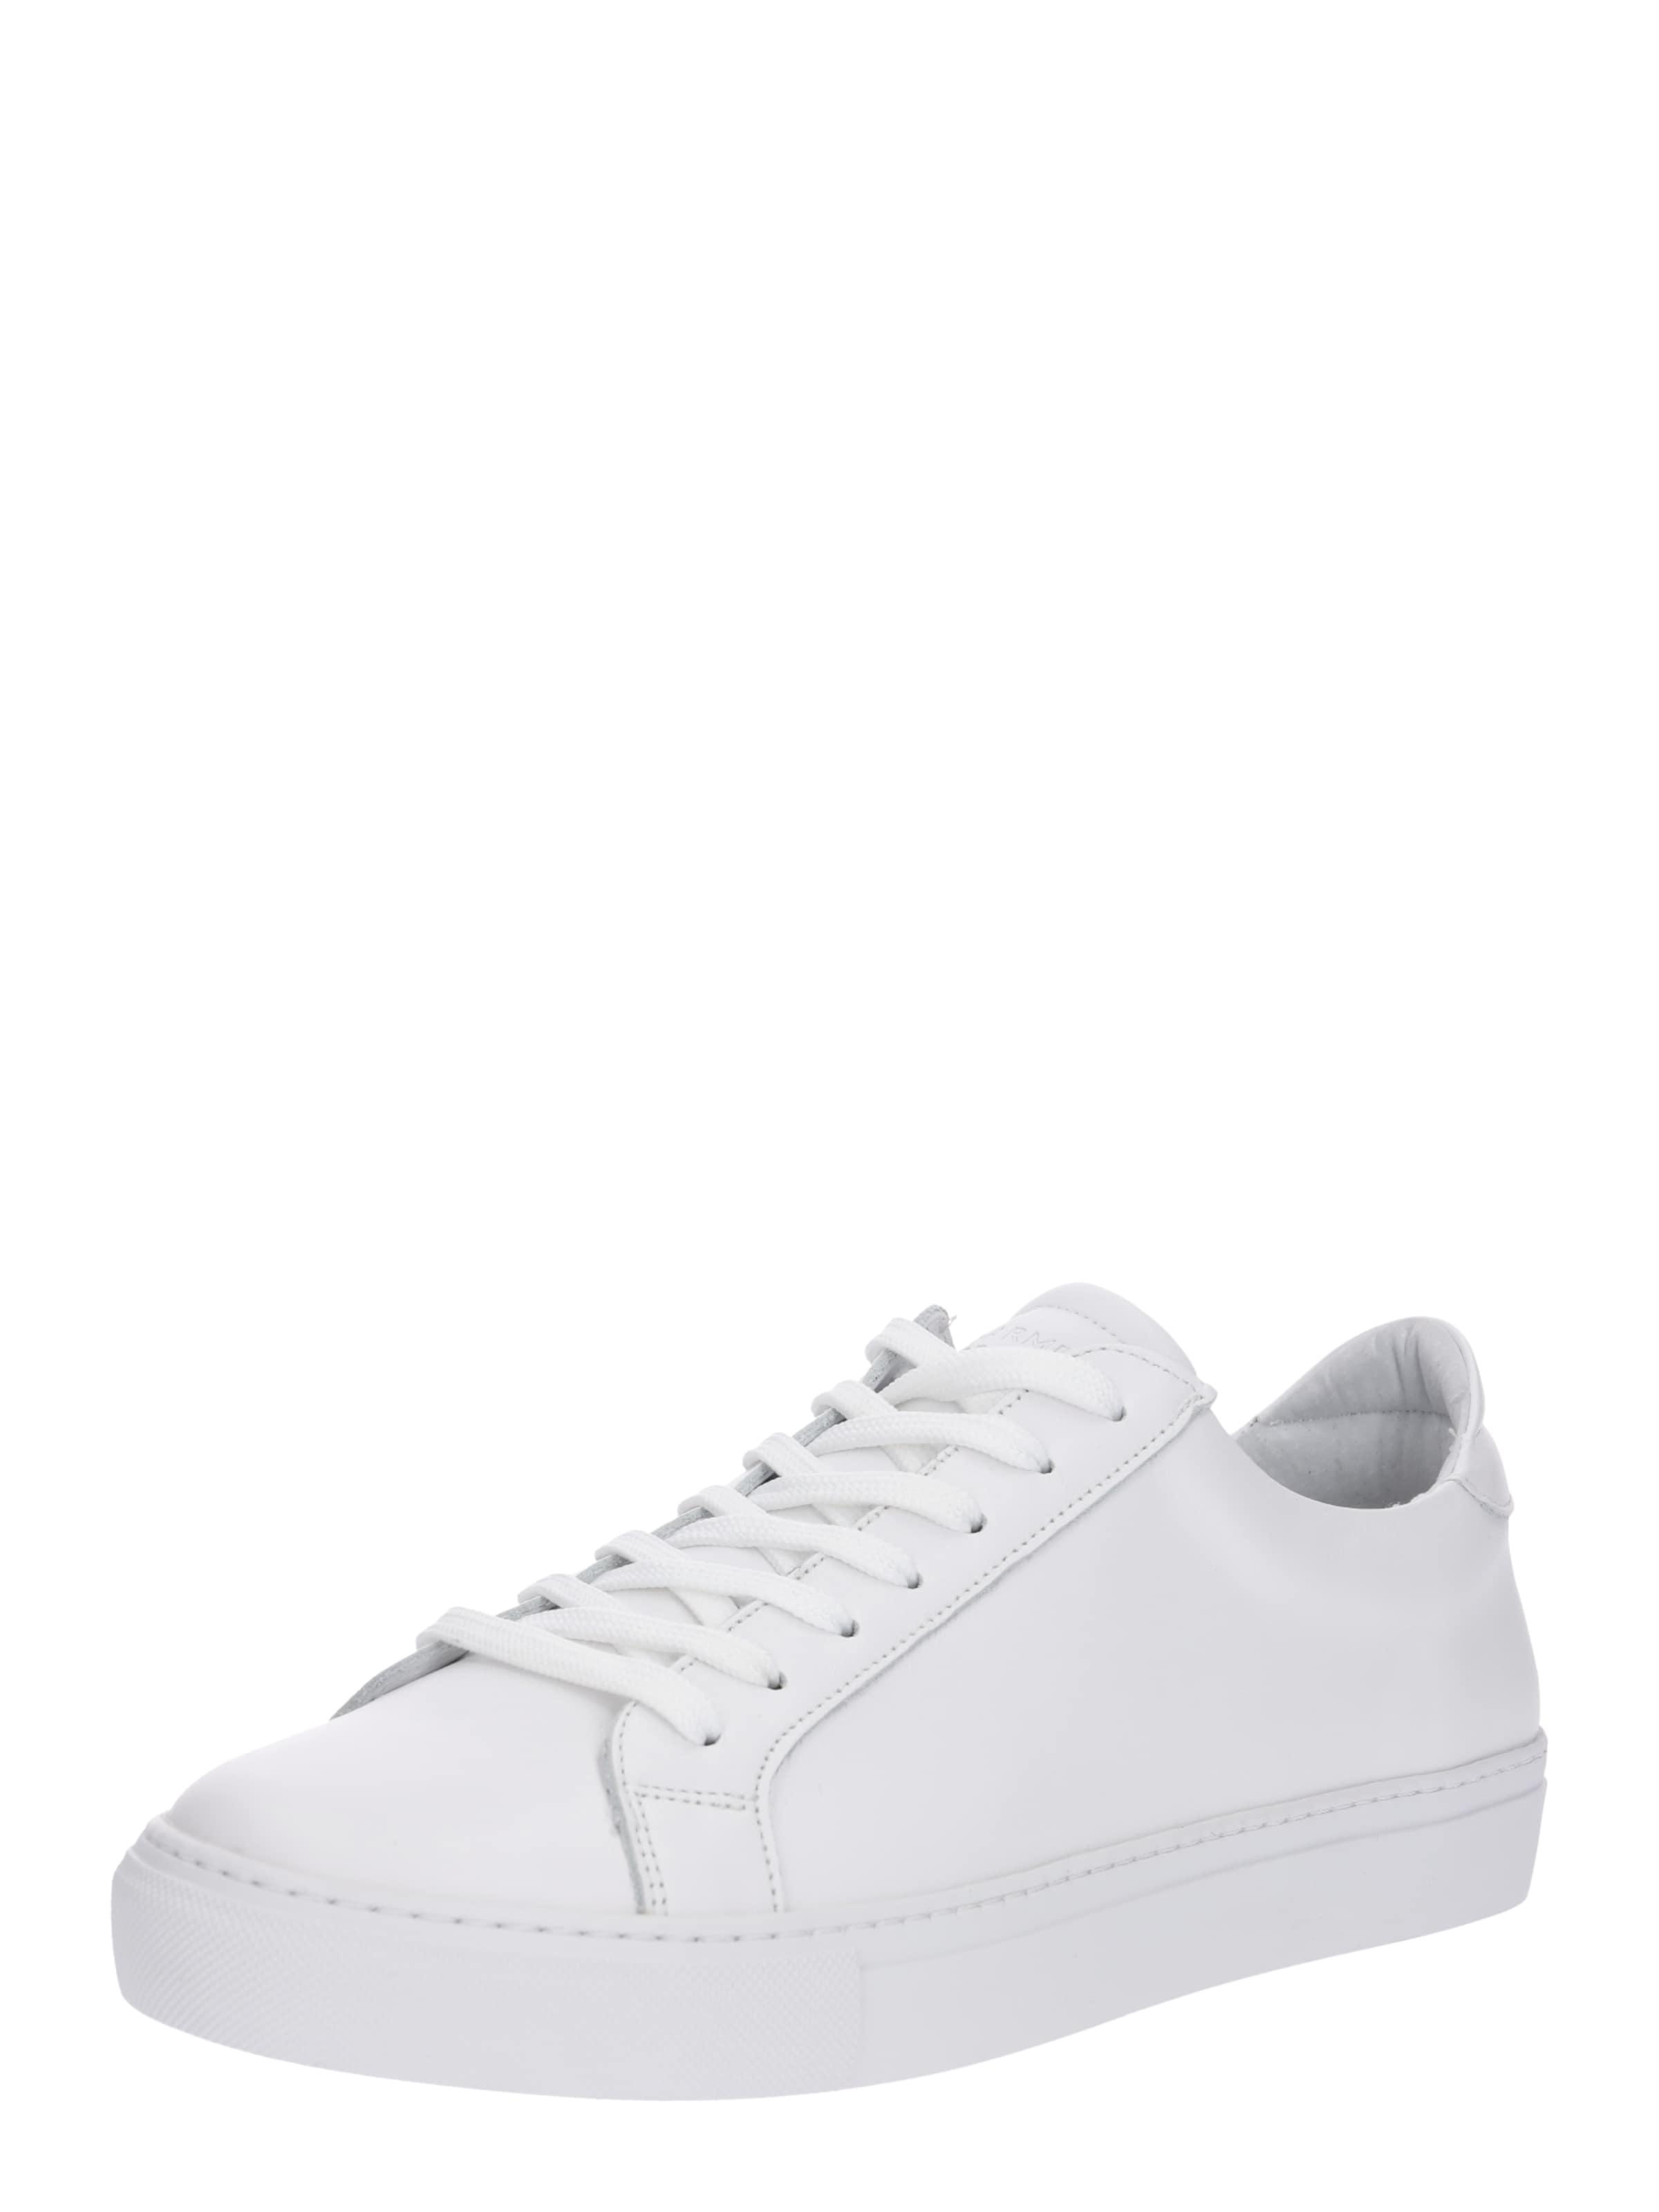 'type' Project Garment Baskets Blanc En Basses 1ulJFK53Tc